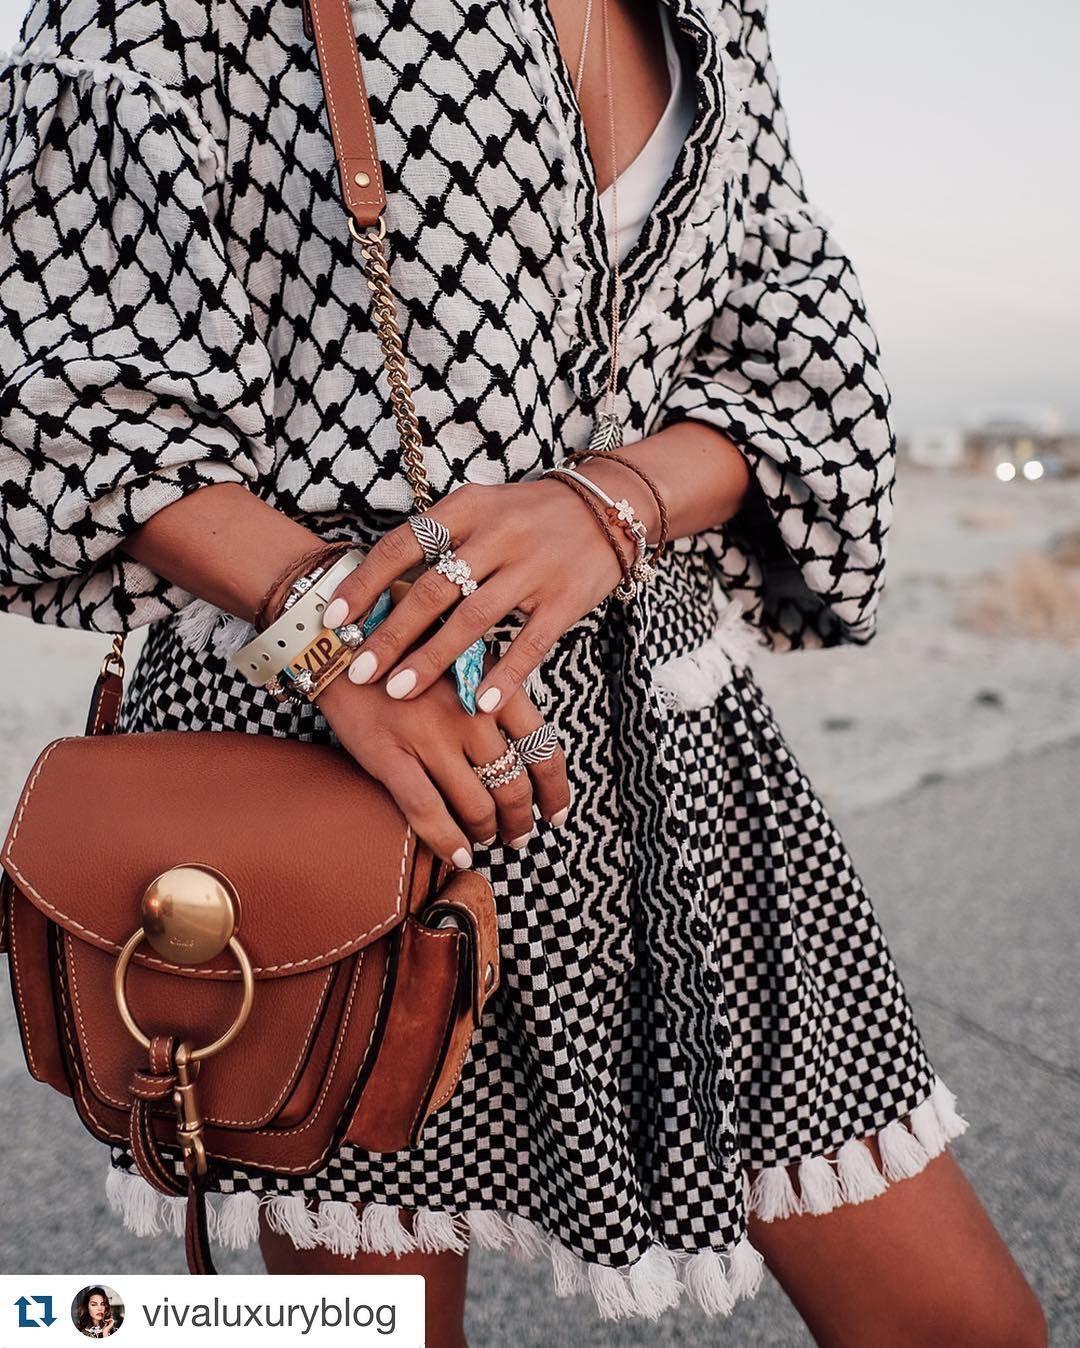 Fringe detail. @vivaluxuryblog #streetstyleswipe #streetfashion #streetstyle #style #fashionroadtest #blackandwhite #checks #checkstyle #fringe #chloebag @chloe #chloebag